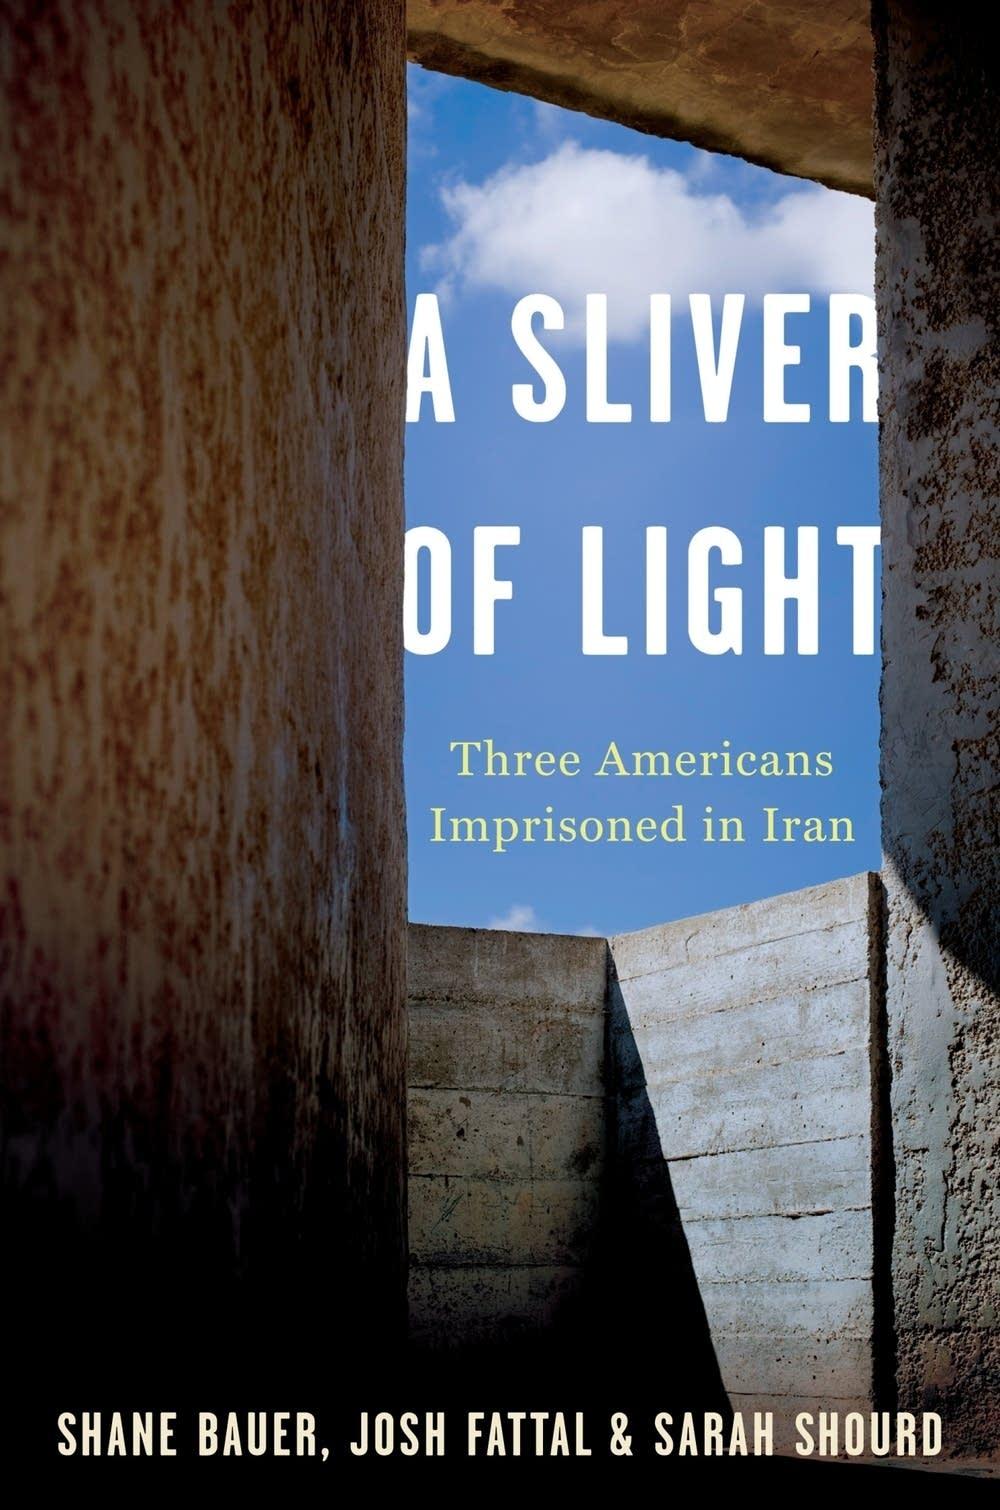 'A Sliver of Light'